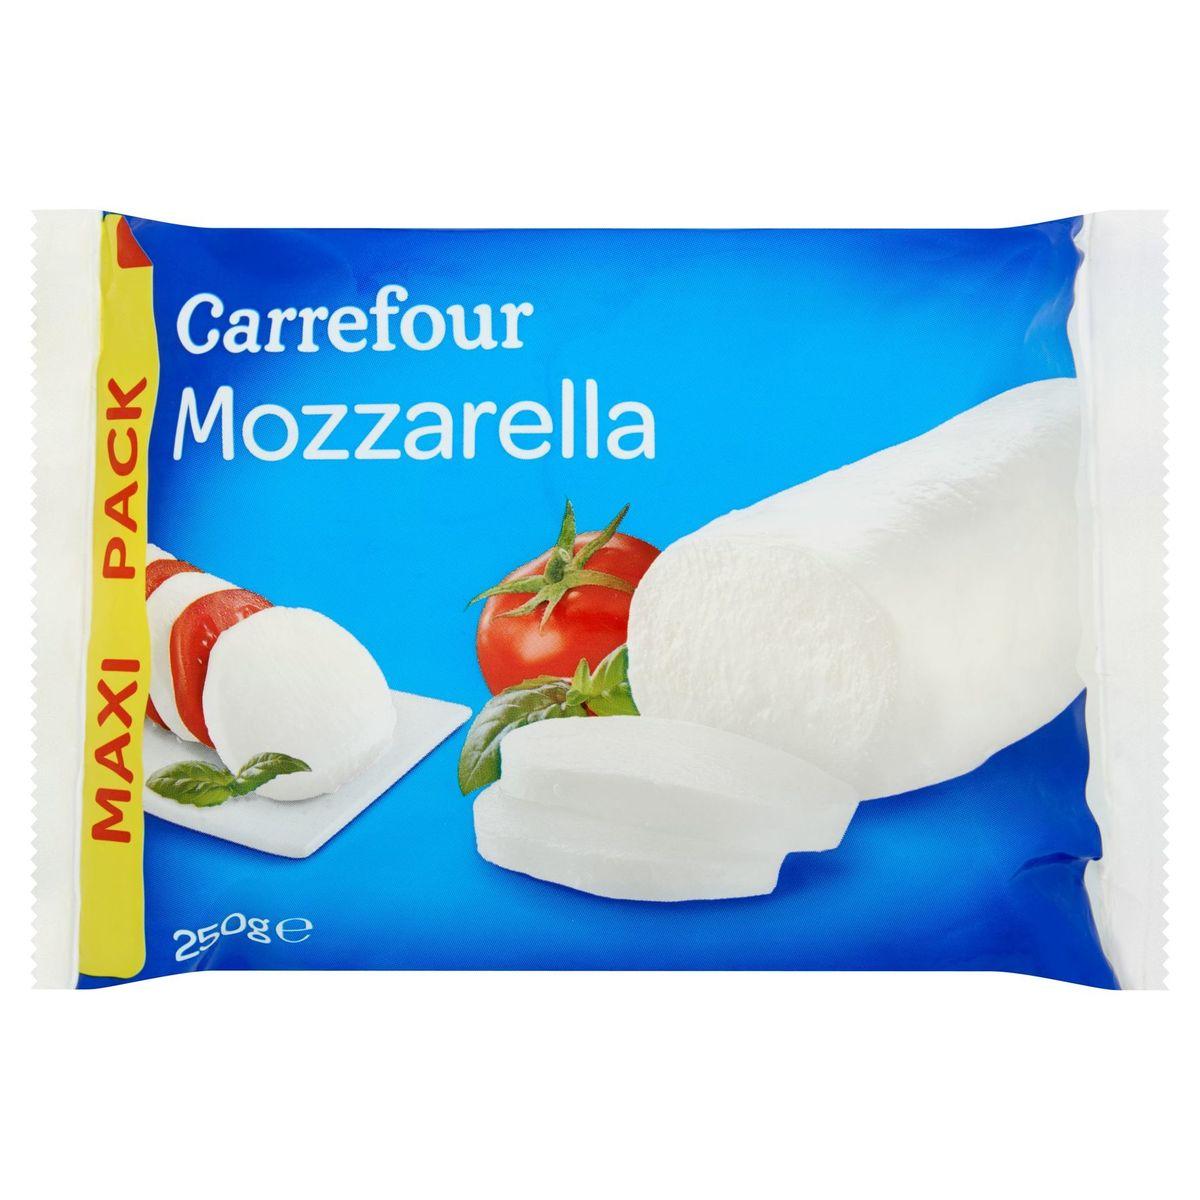 Carrefour Mozzarella Maxi Pack 250 g